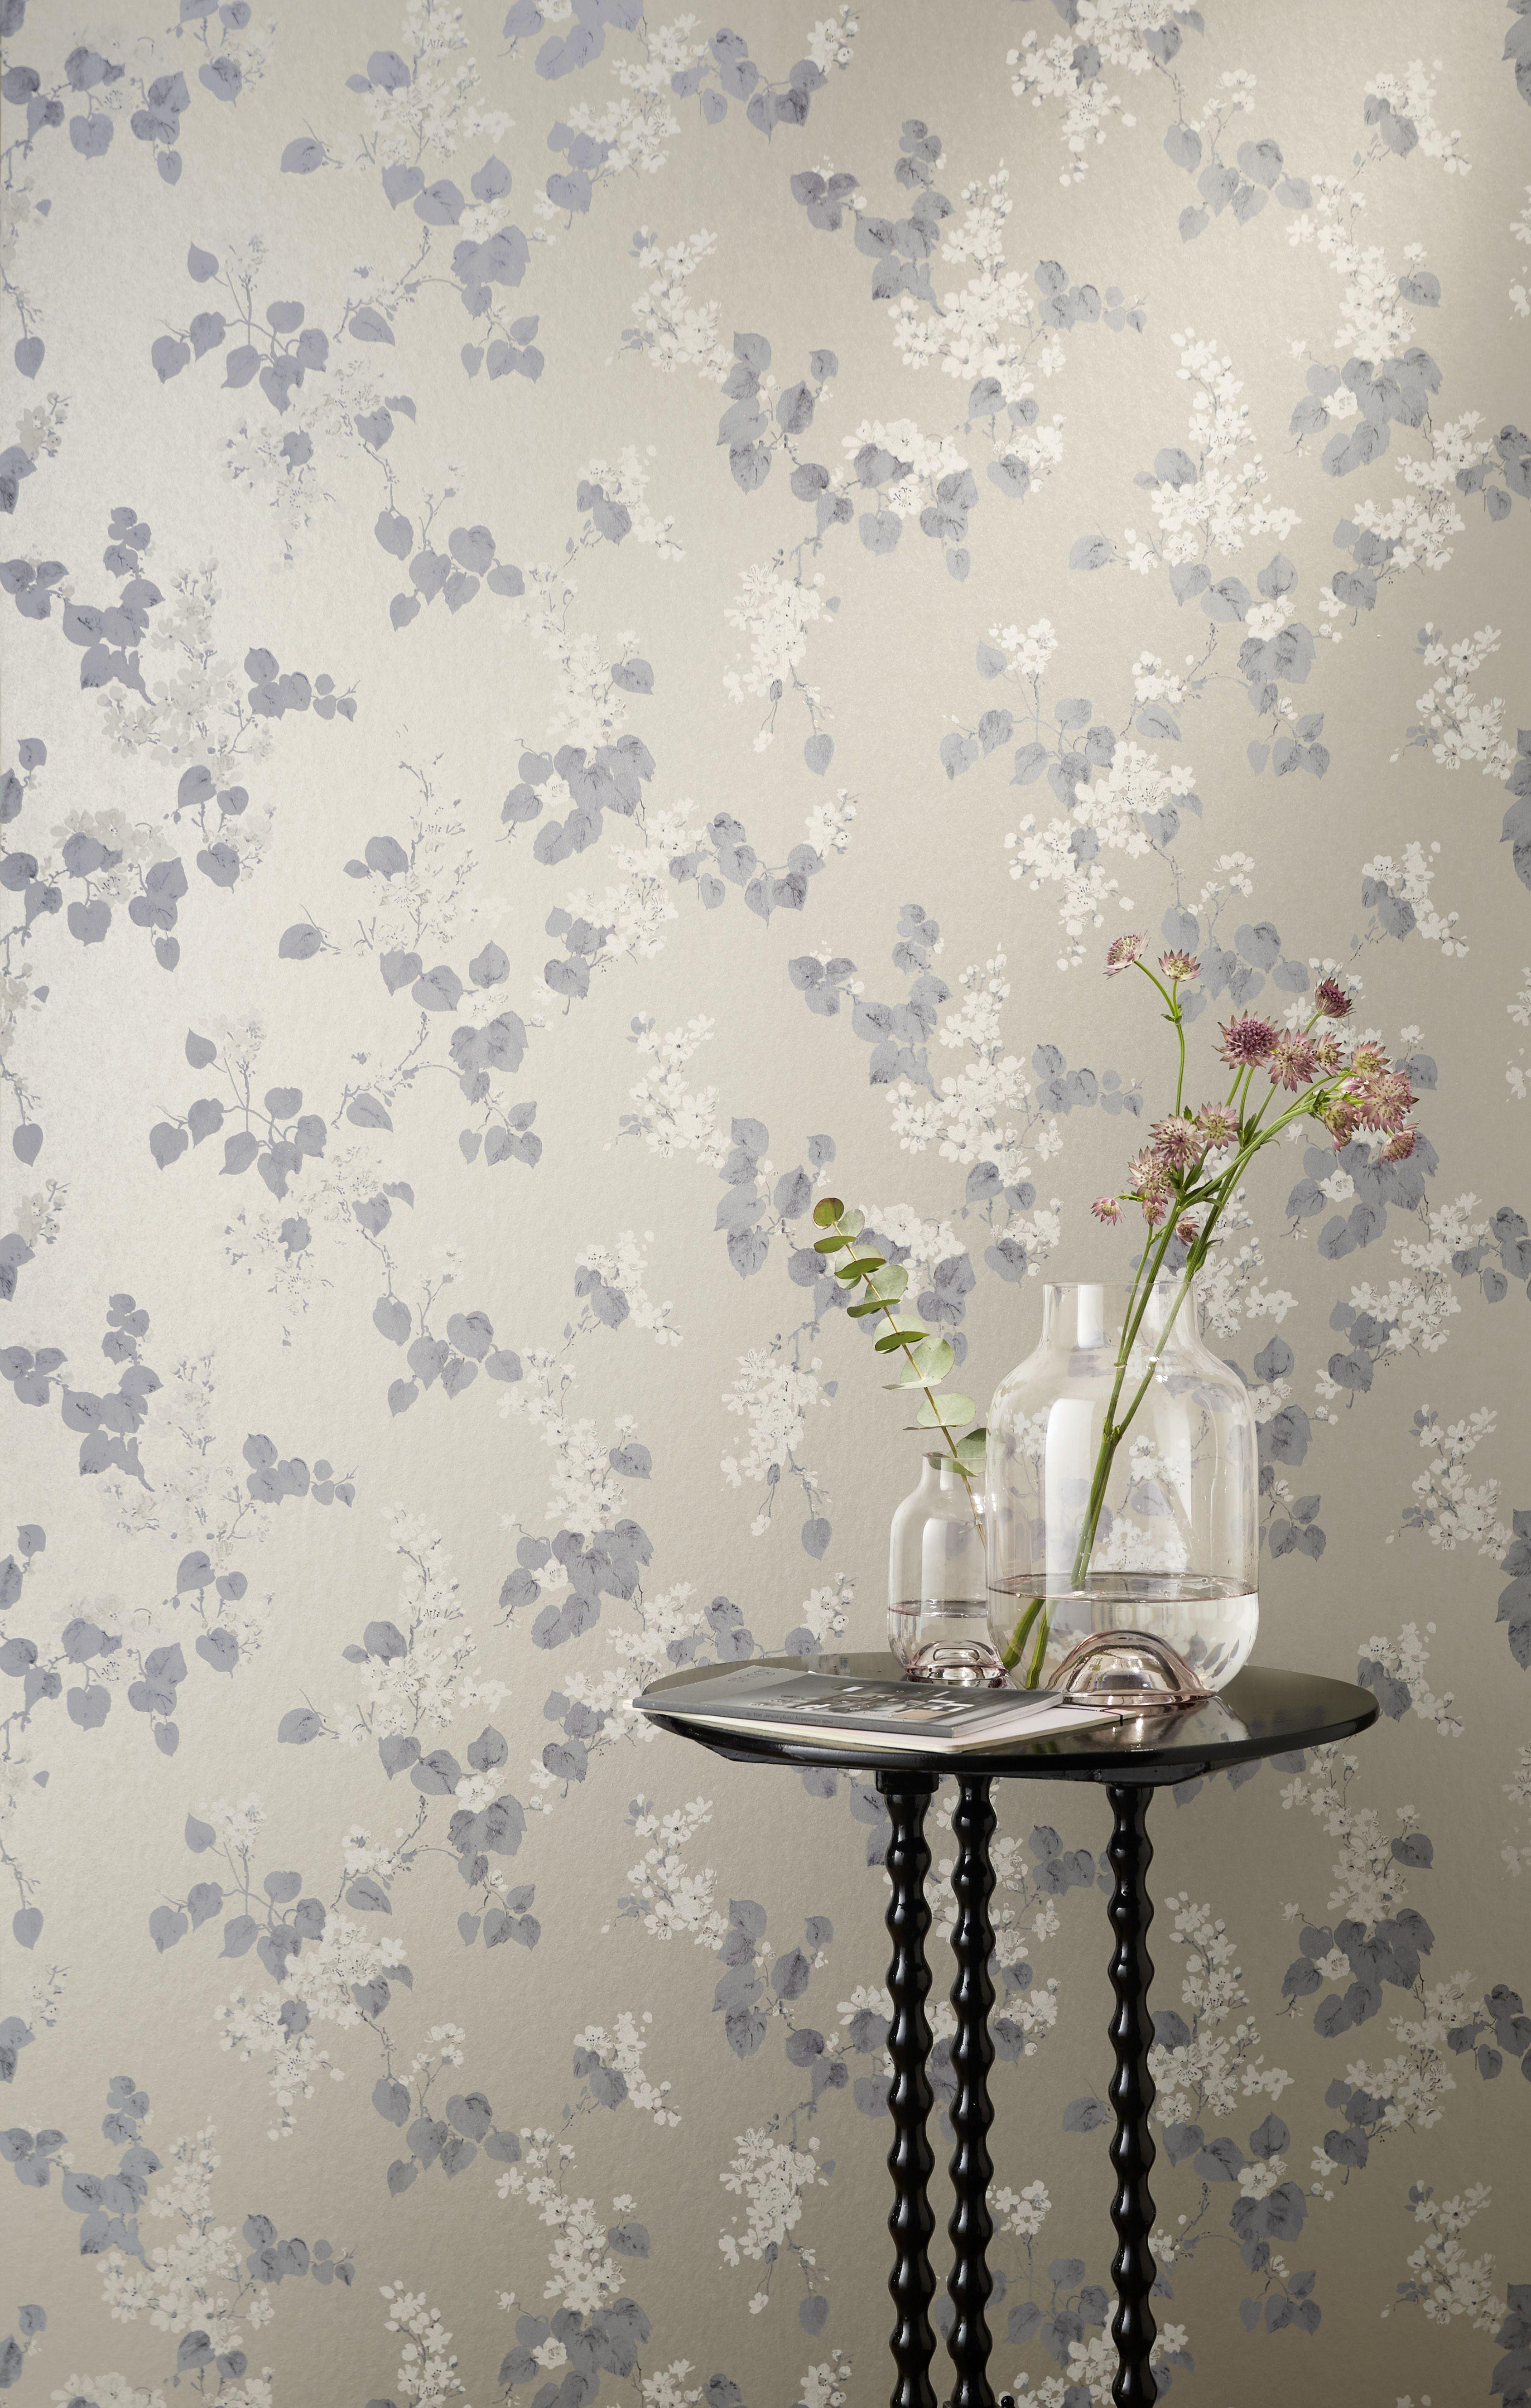 Emilia Wallpaper Collection Haus Auf Dem Land Tapeten